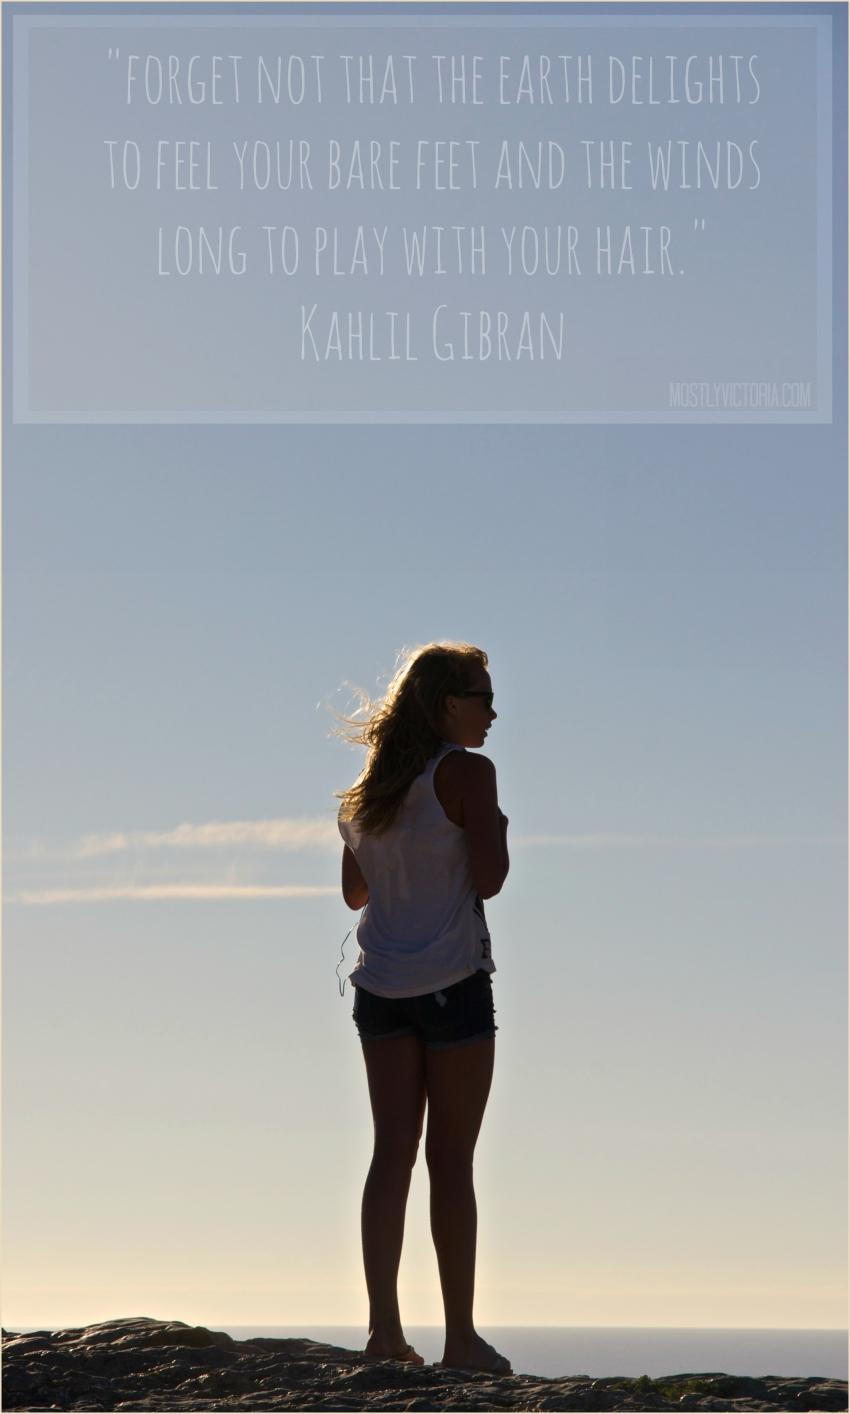 TRAVEL QUOTE #1 World Travel Life Inspiration - kahlil gibran